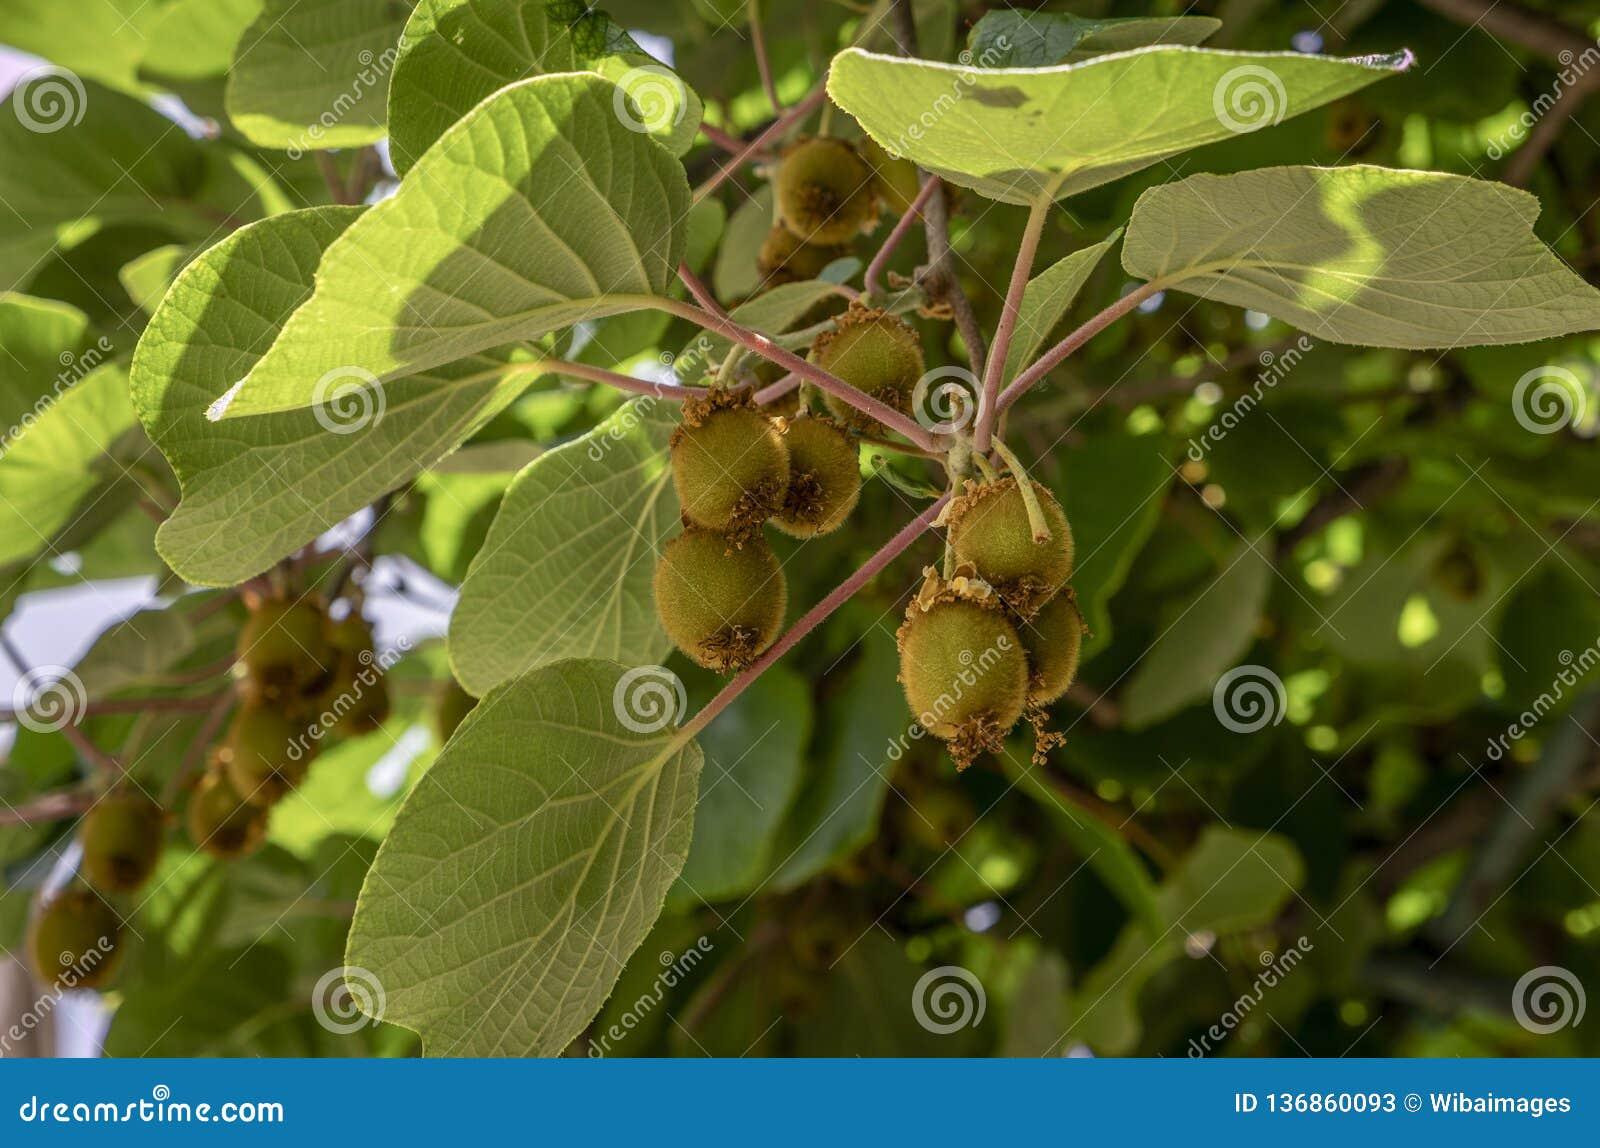 猕猴桃,猕猴桃deliciosa